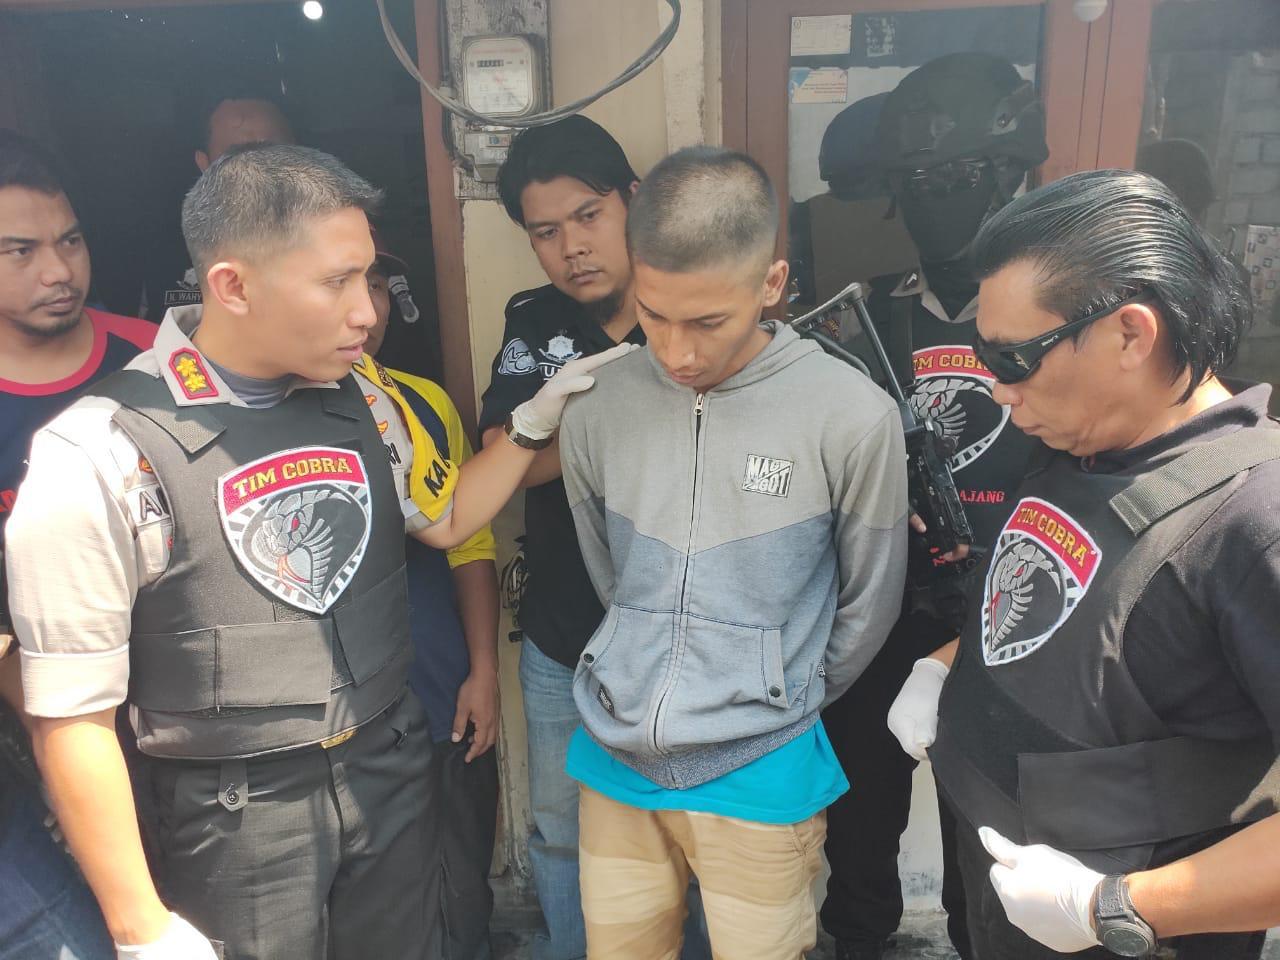 Tim Cobra Narkoba Polres Lumajang Tangkap Pengedar Narkoba 77,7 GR,  Diduga Jaringan Sokobanah Sampang